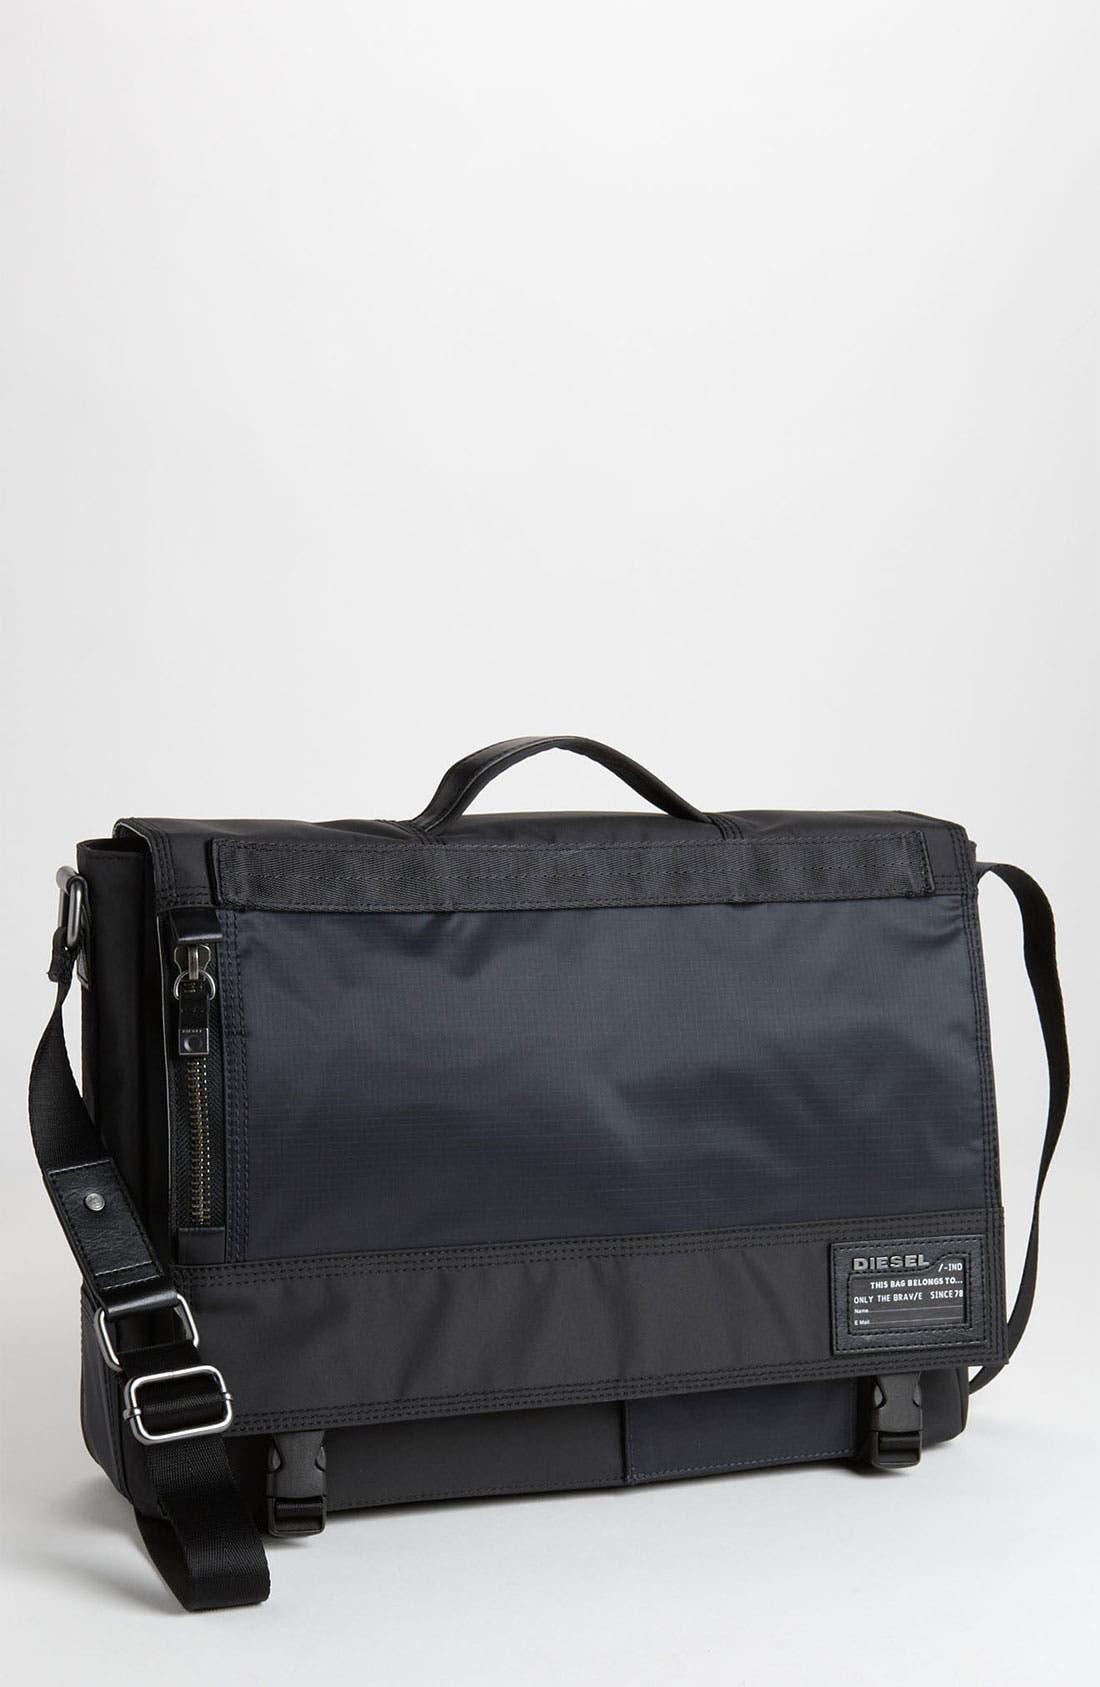 Alternate Image 1 Selected - DIESEL® 'Processor CPU' Laptop Crossbody Bag